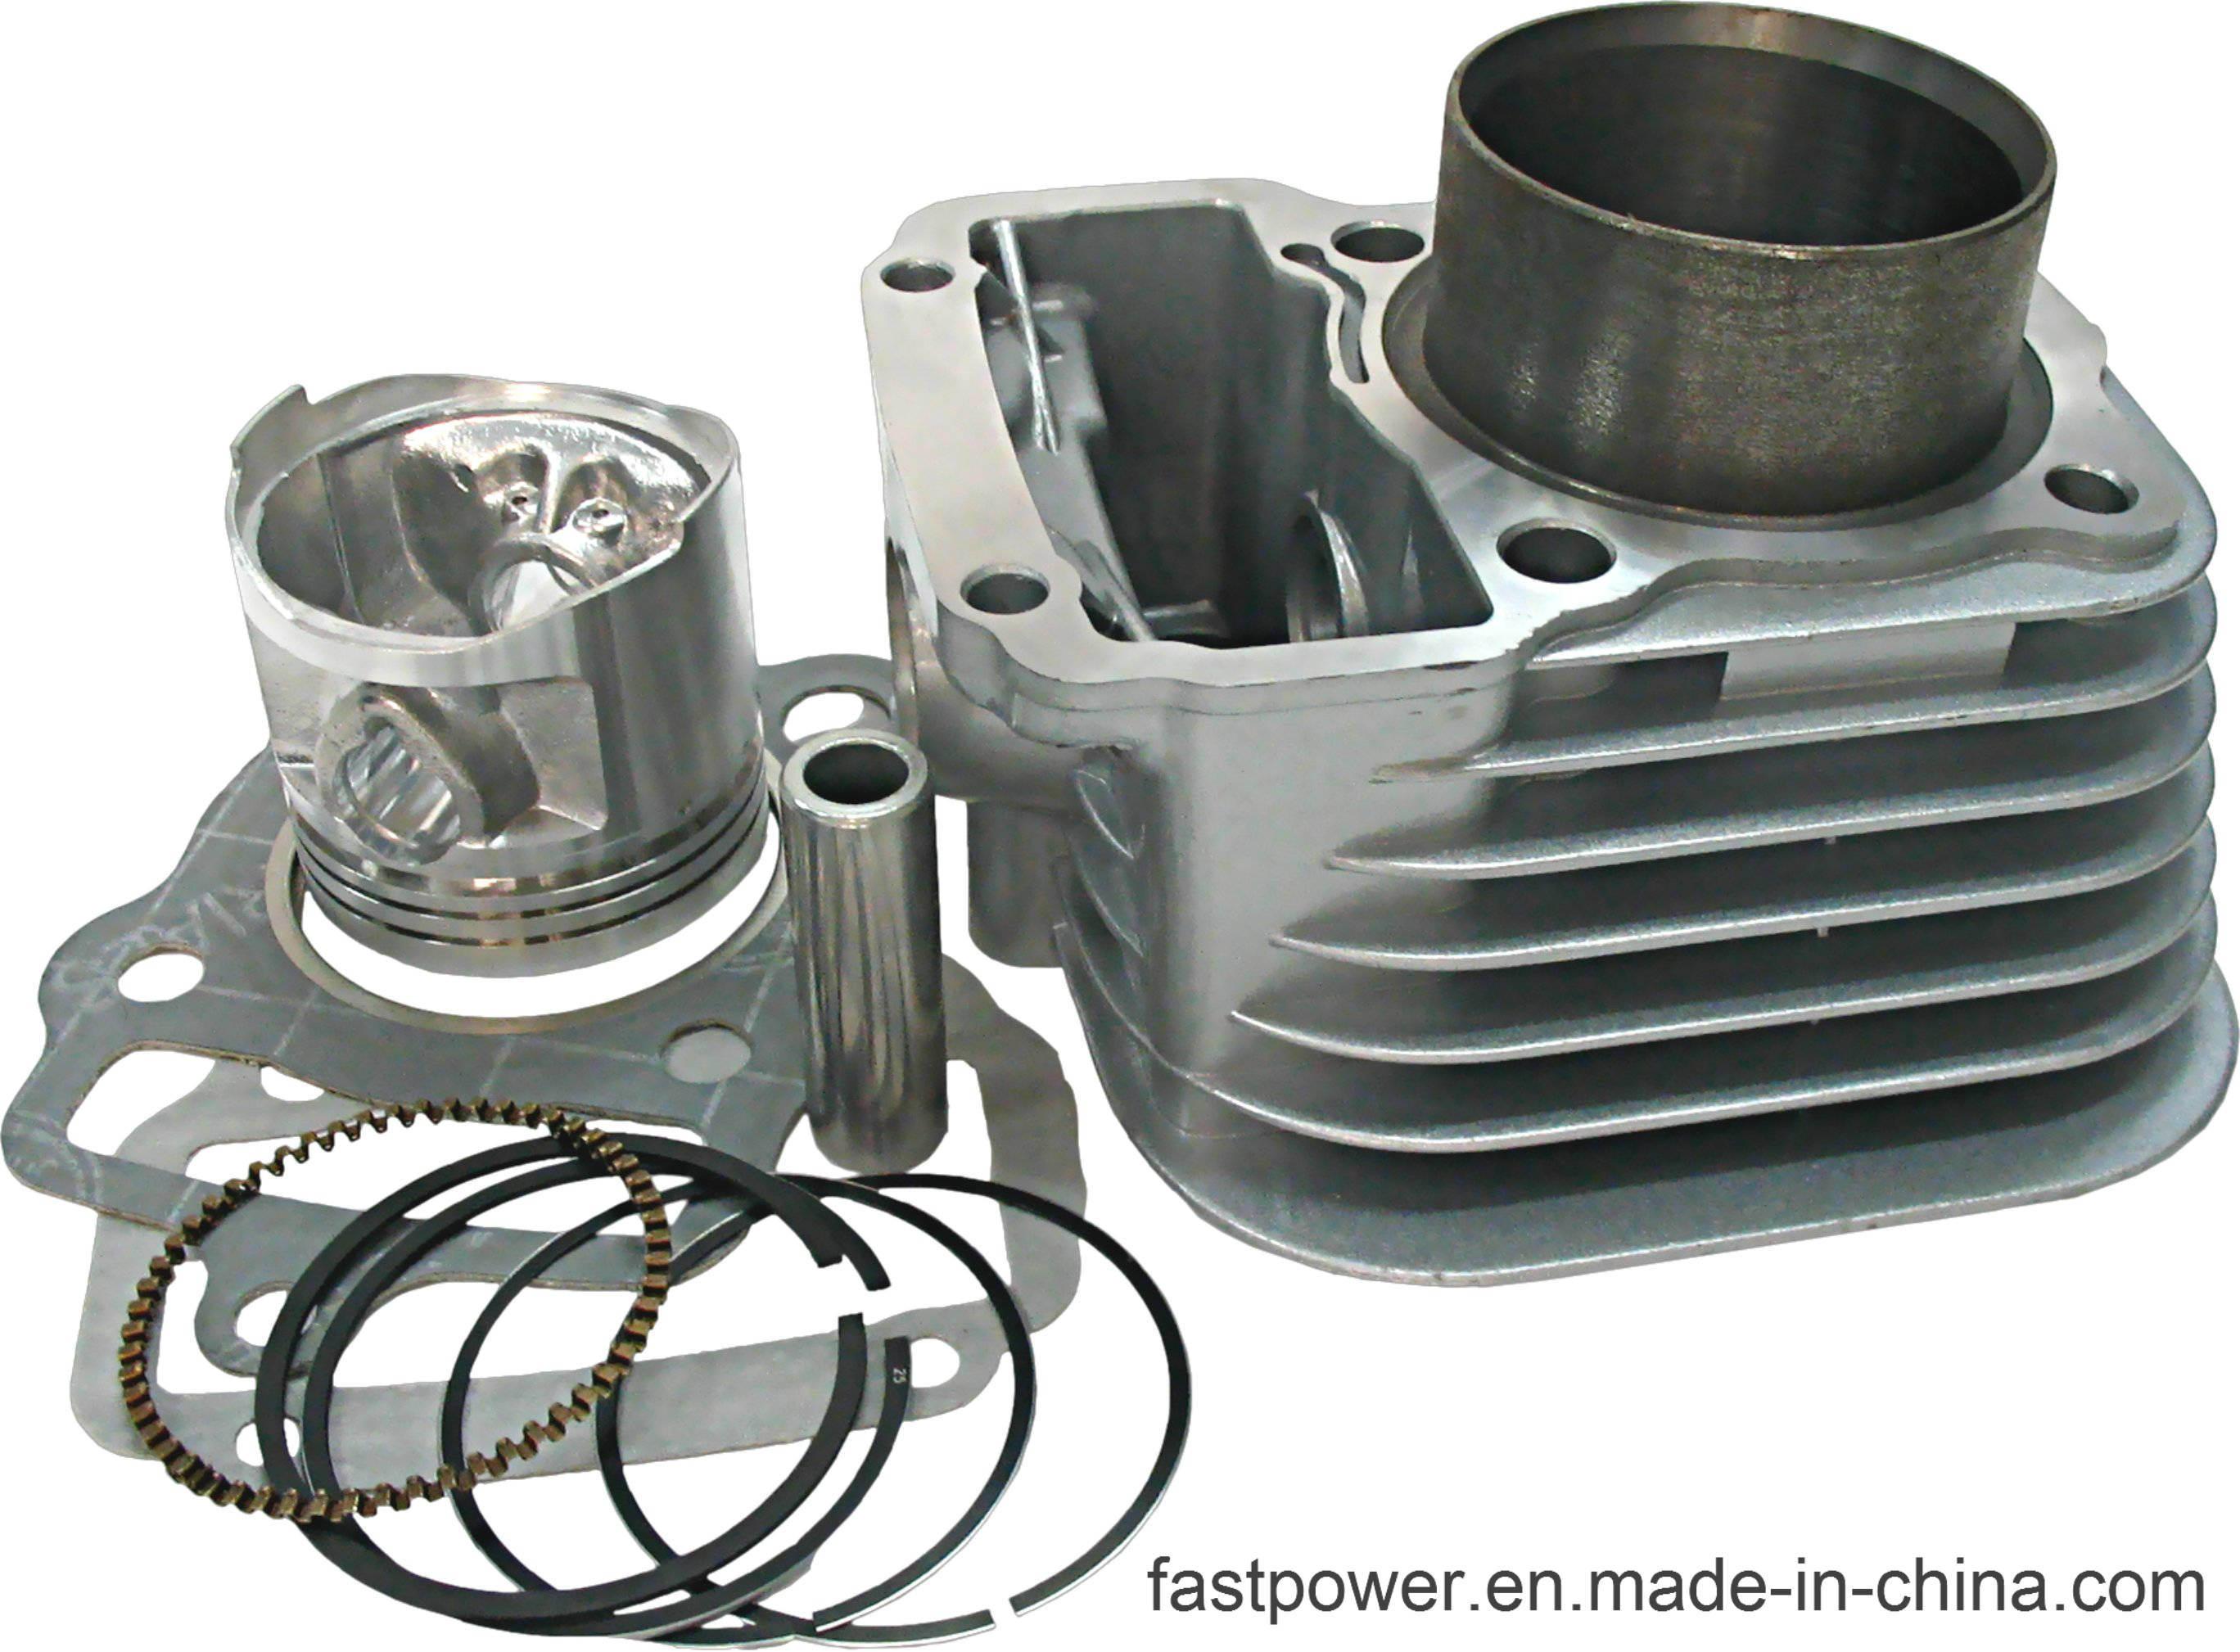 Motorcycle Engine Part, Cylinder Set